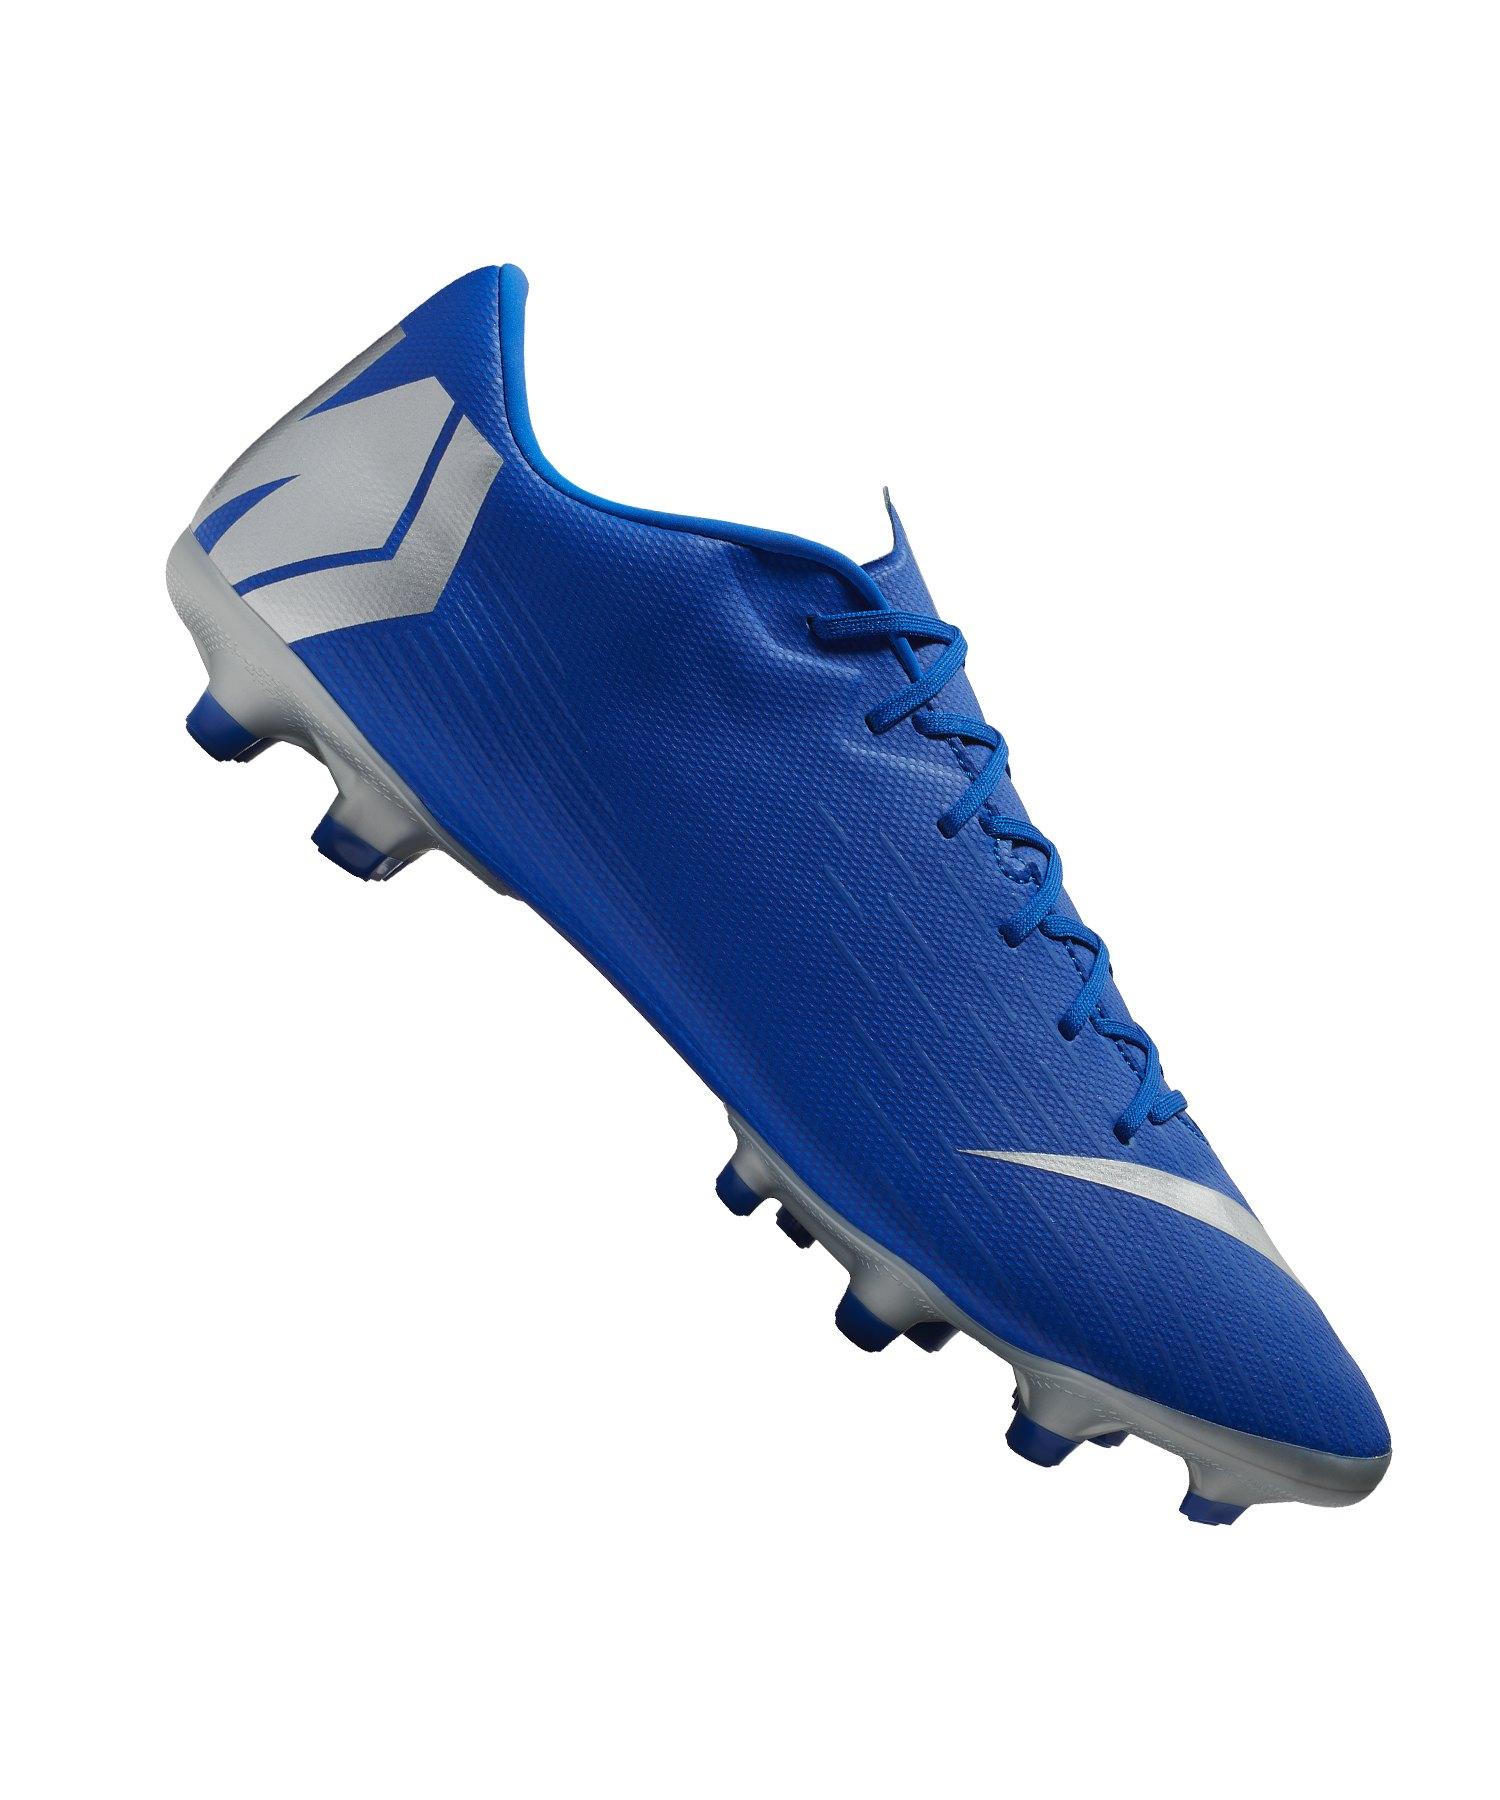 58€| Nike Fußballschuhe Mit Socken Sale Nike Mercurial